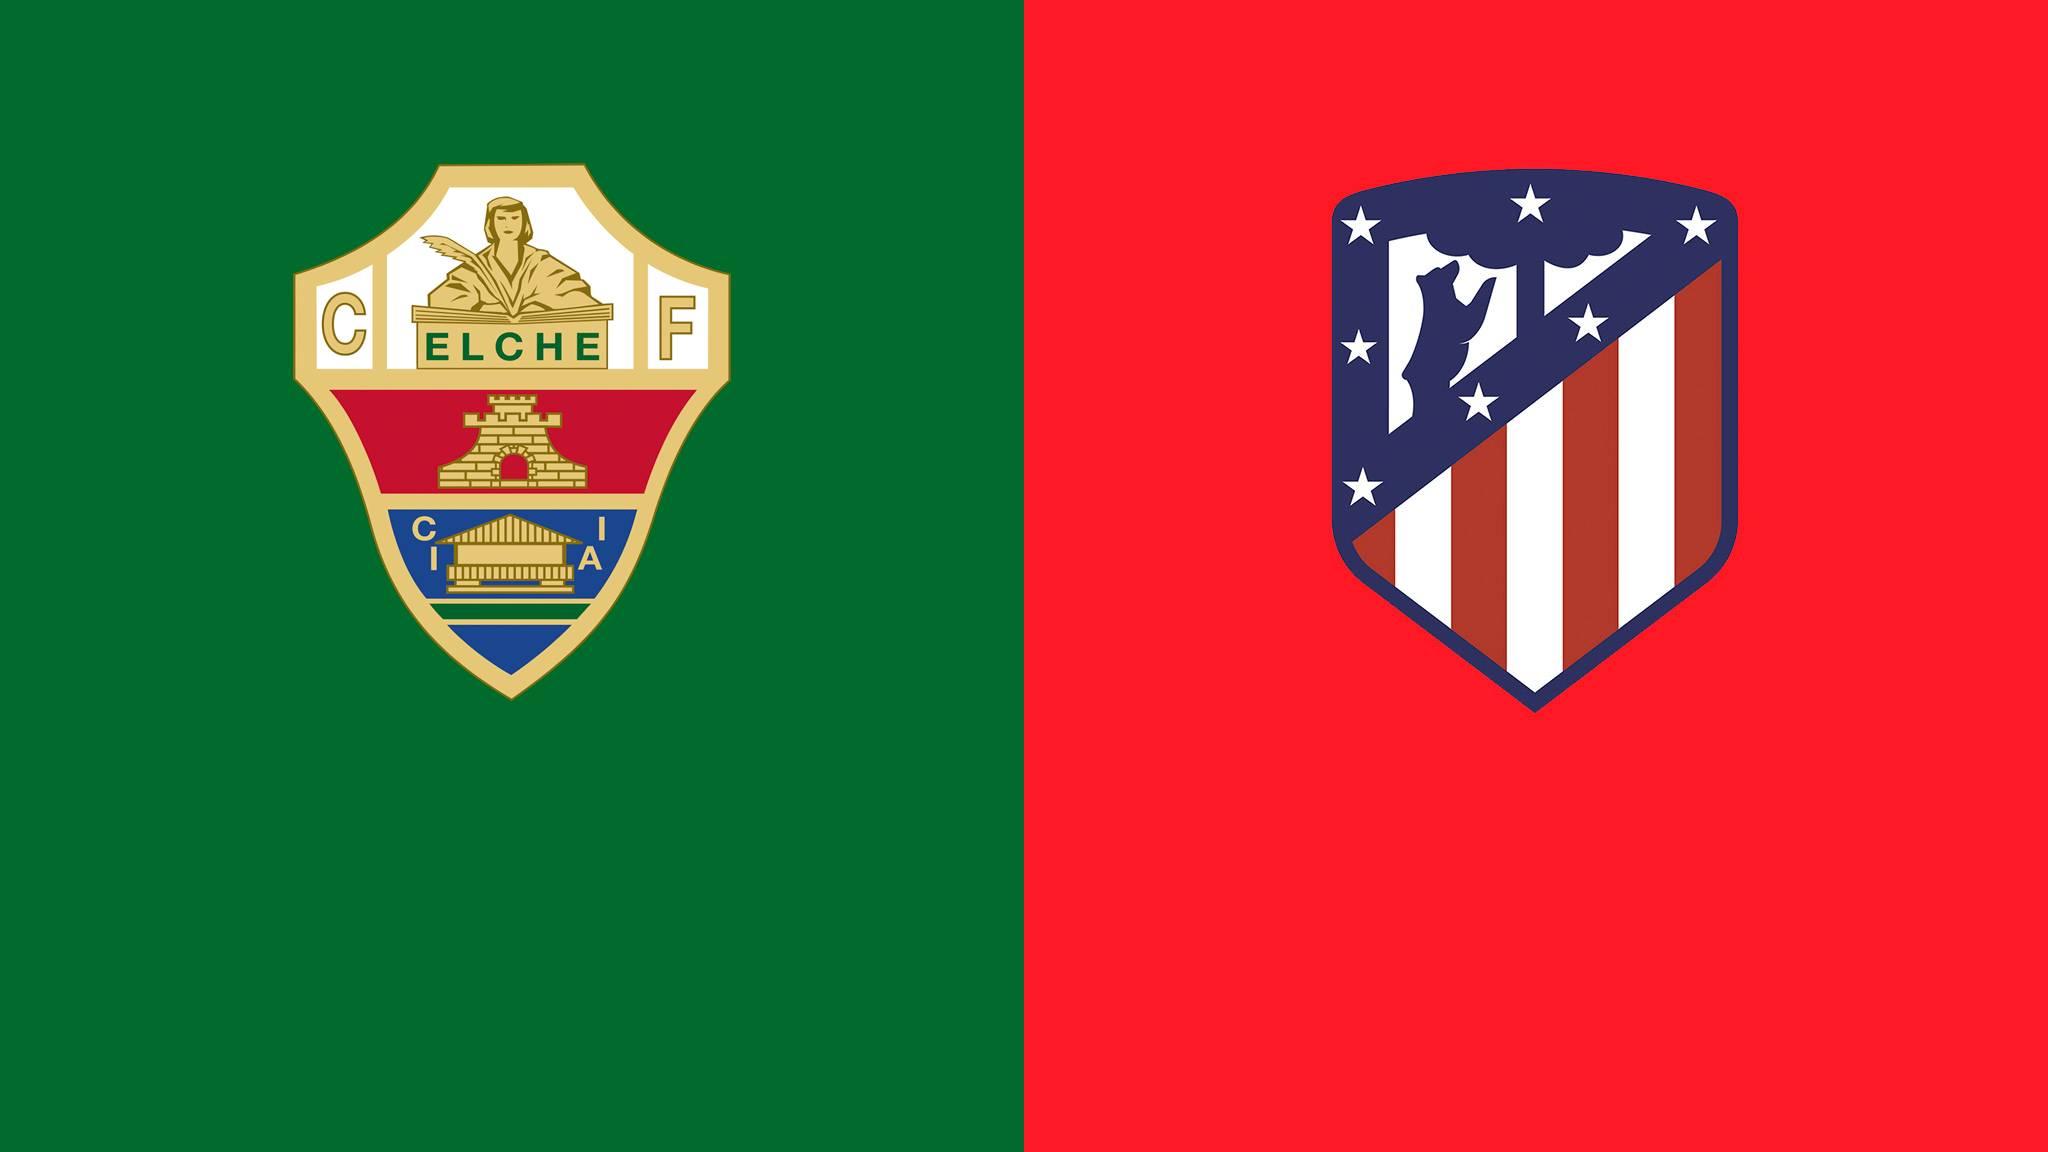 Elche - Atletico Madrid Live Stream | Gratismonat Starten